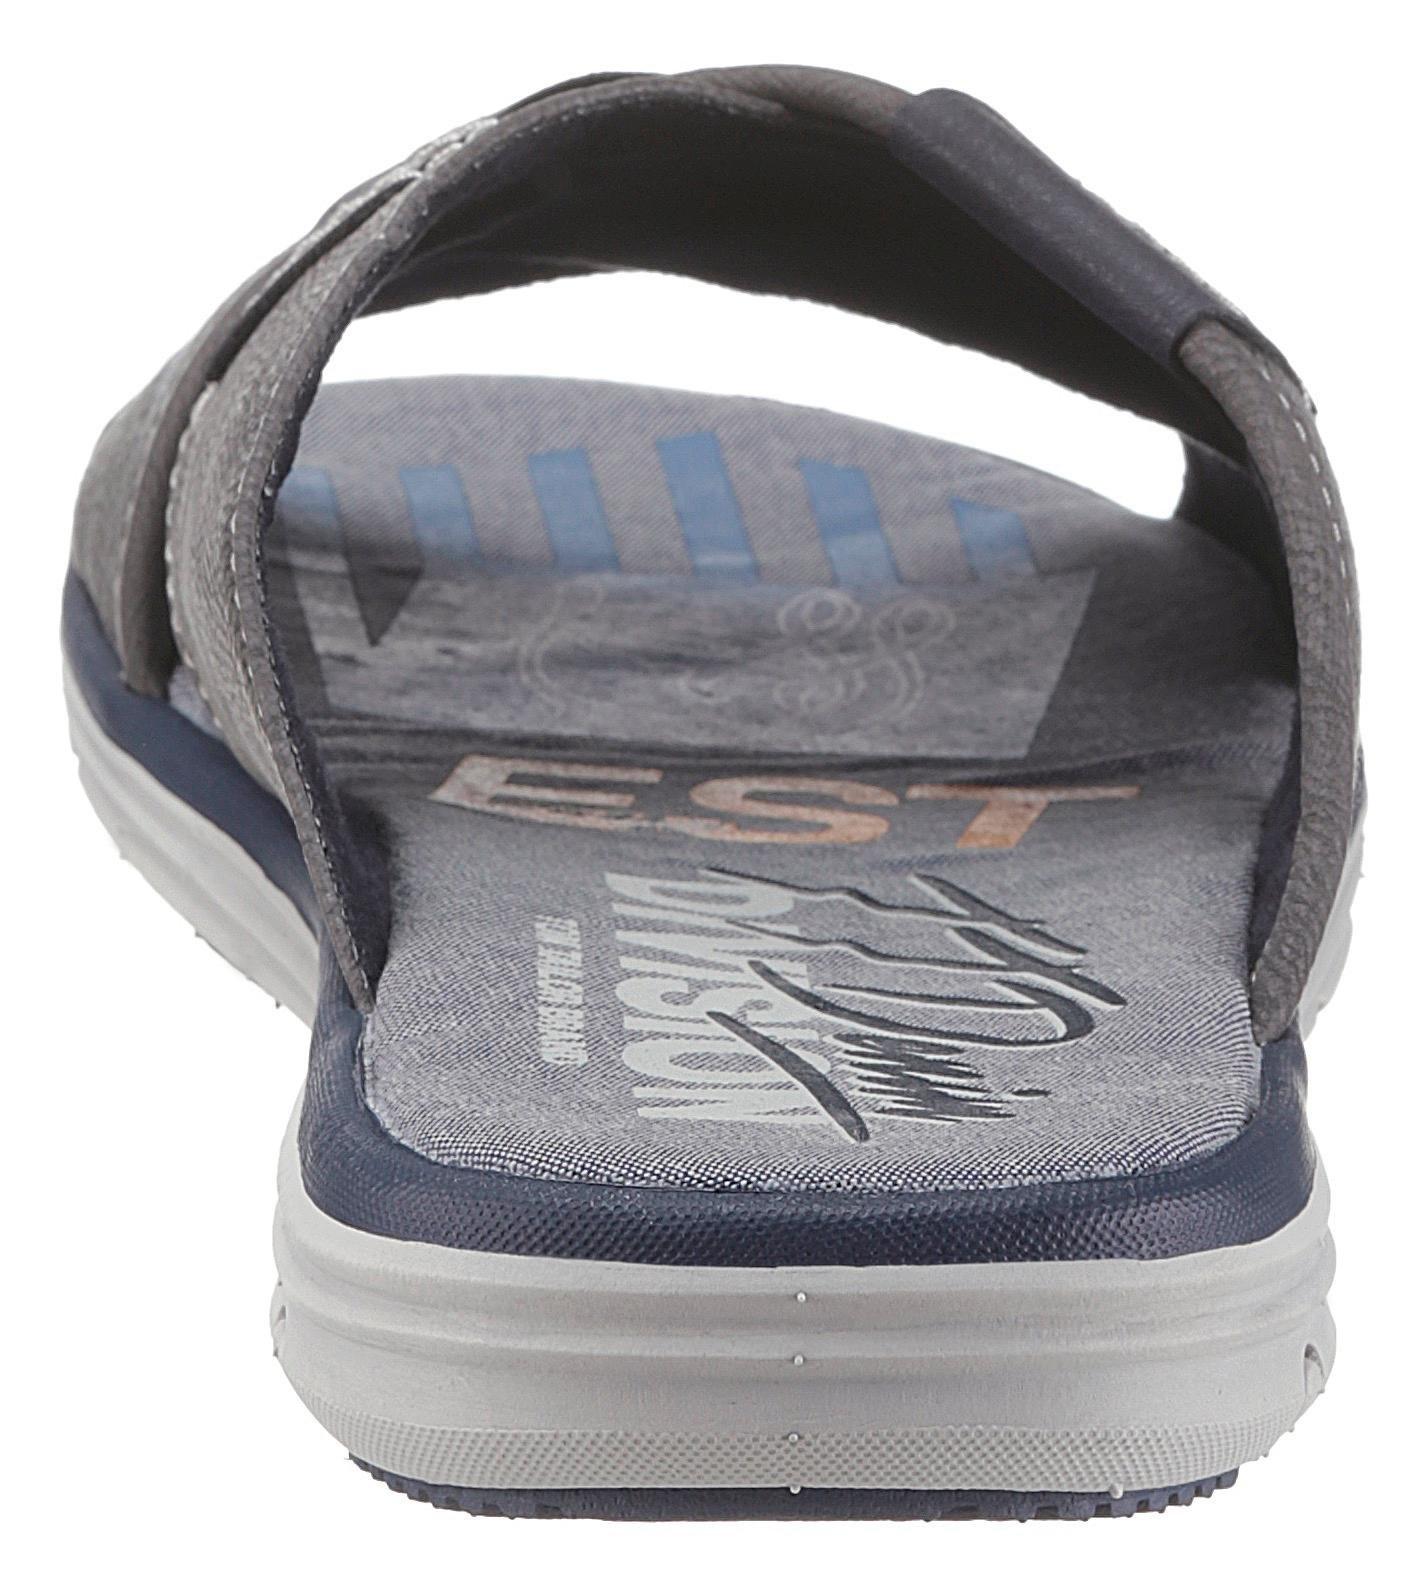 Slippers Tailor Shop Online Tom In De 0mNwnOv8